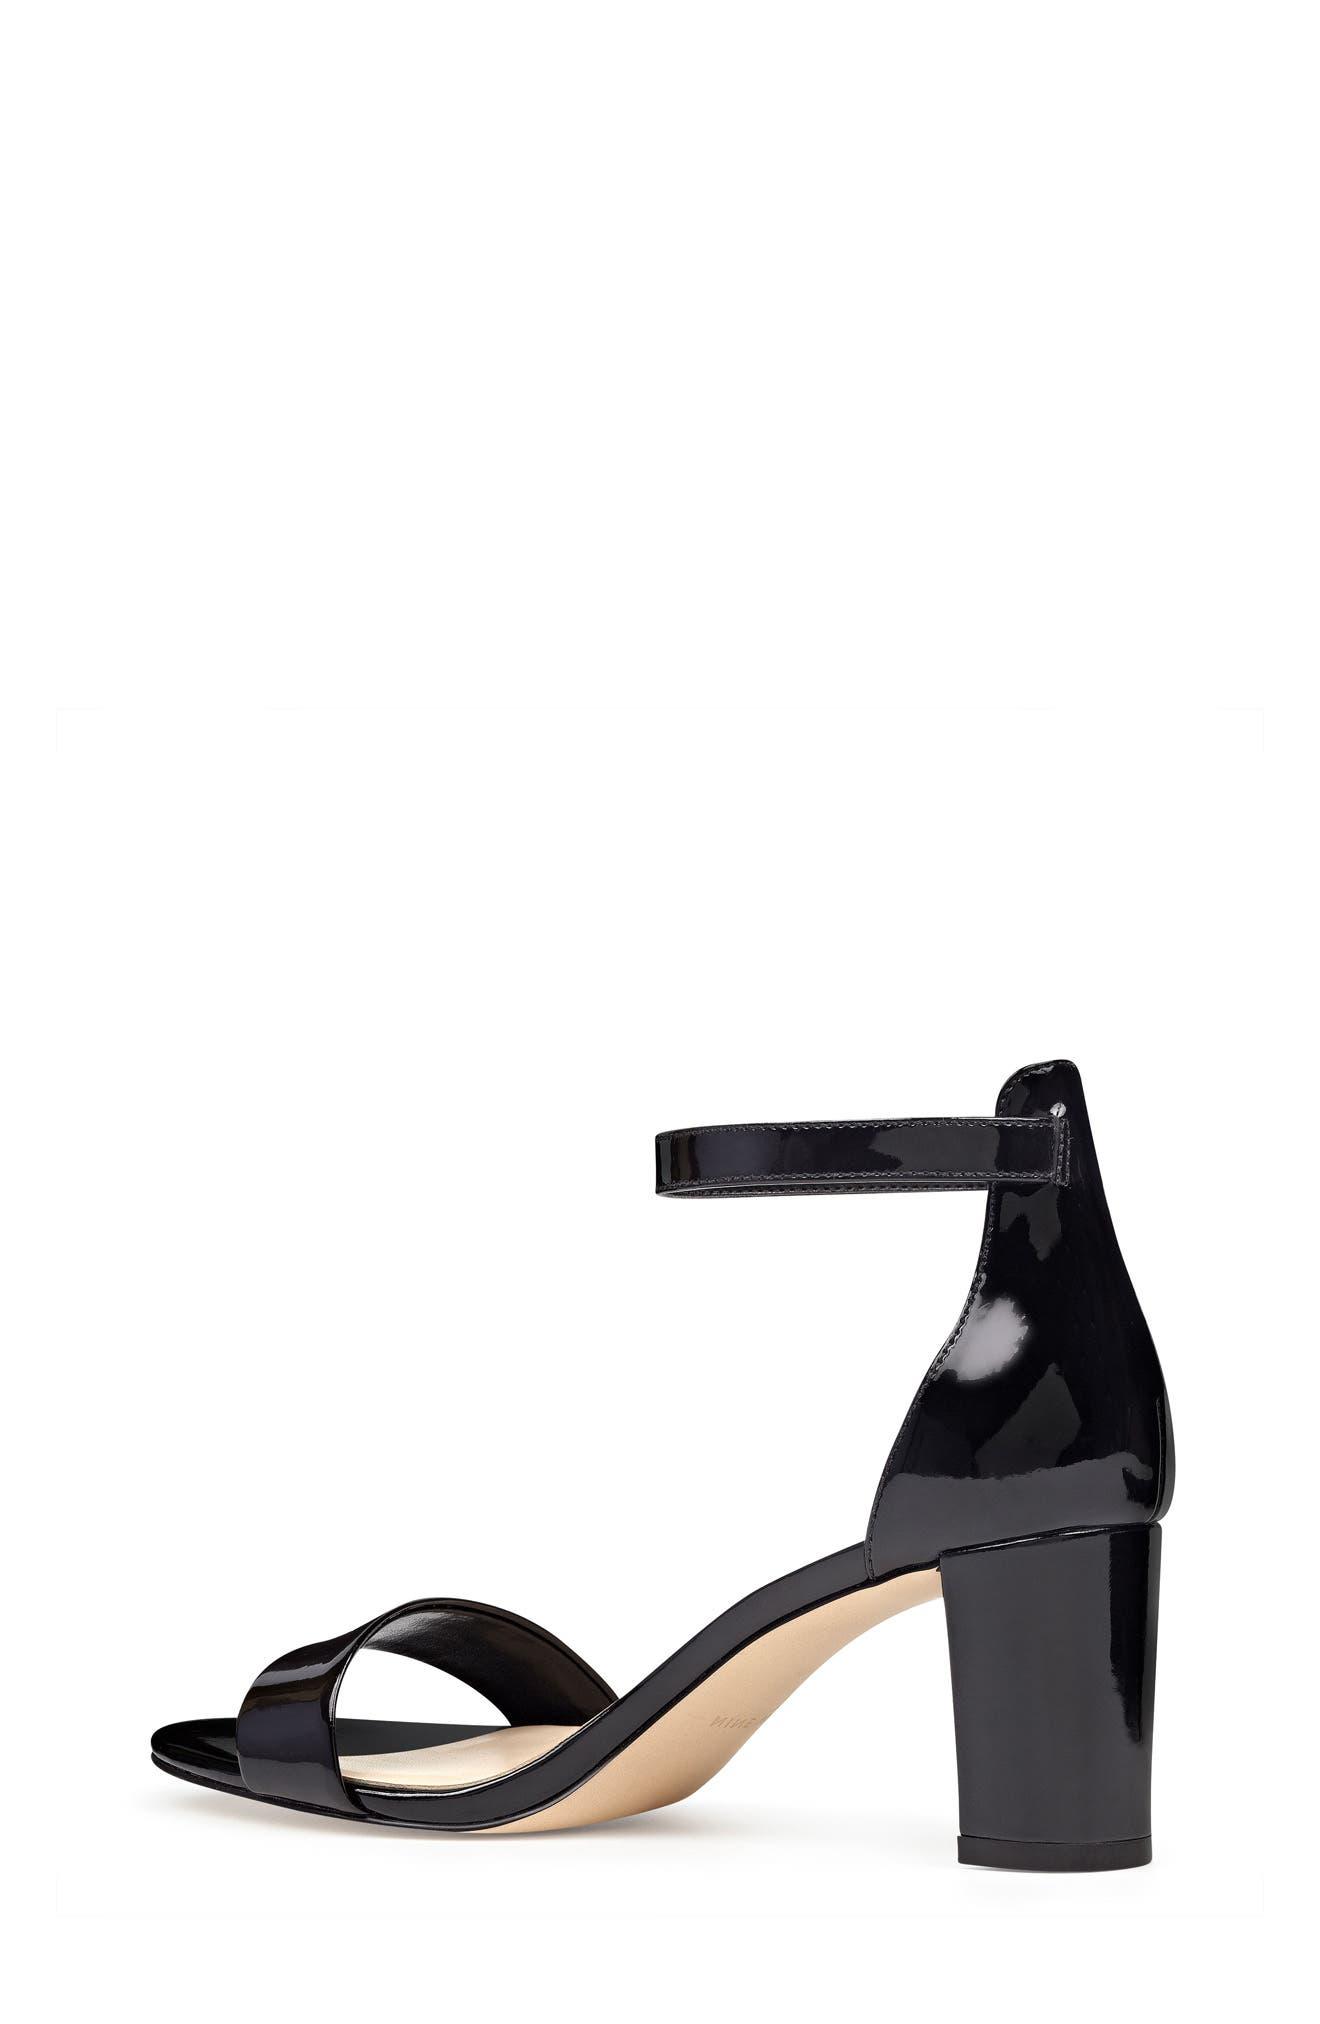 NINE WEST, Pruce Ankle Strap Sandal, Alternate thumbnail 2, color, BLACK PATENT